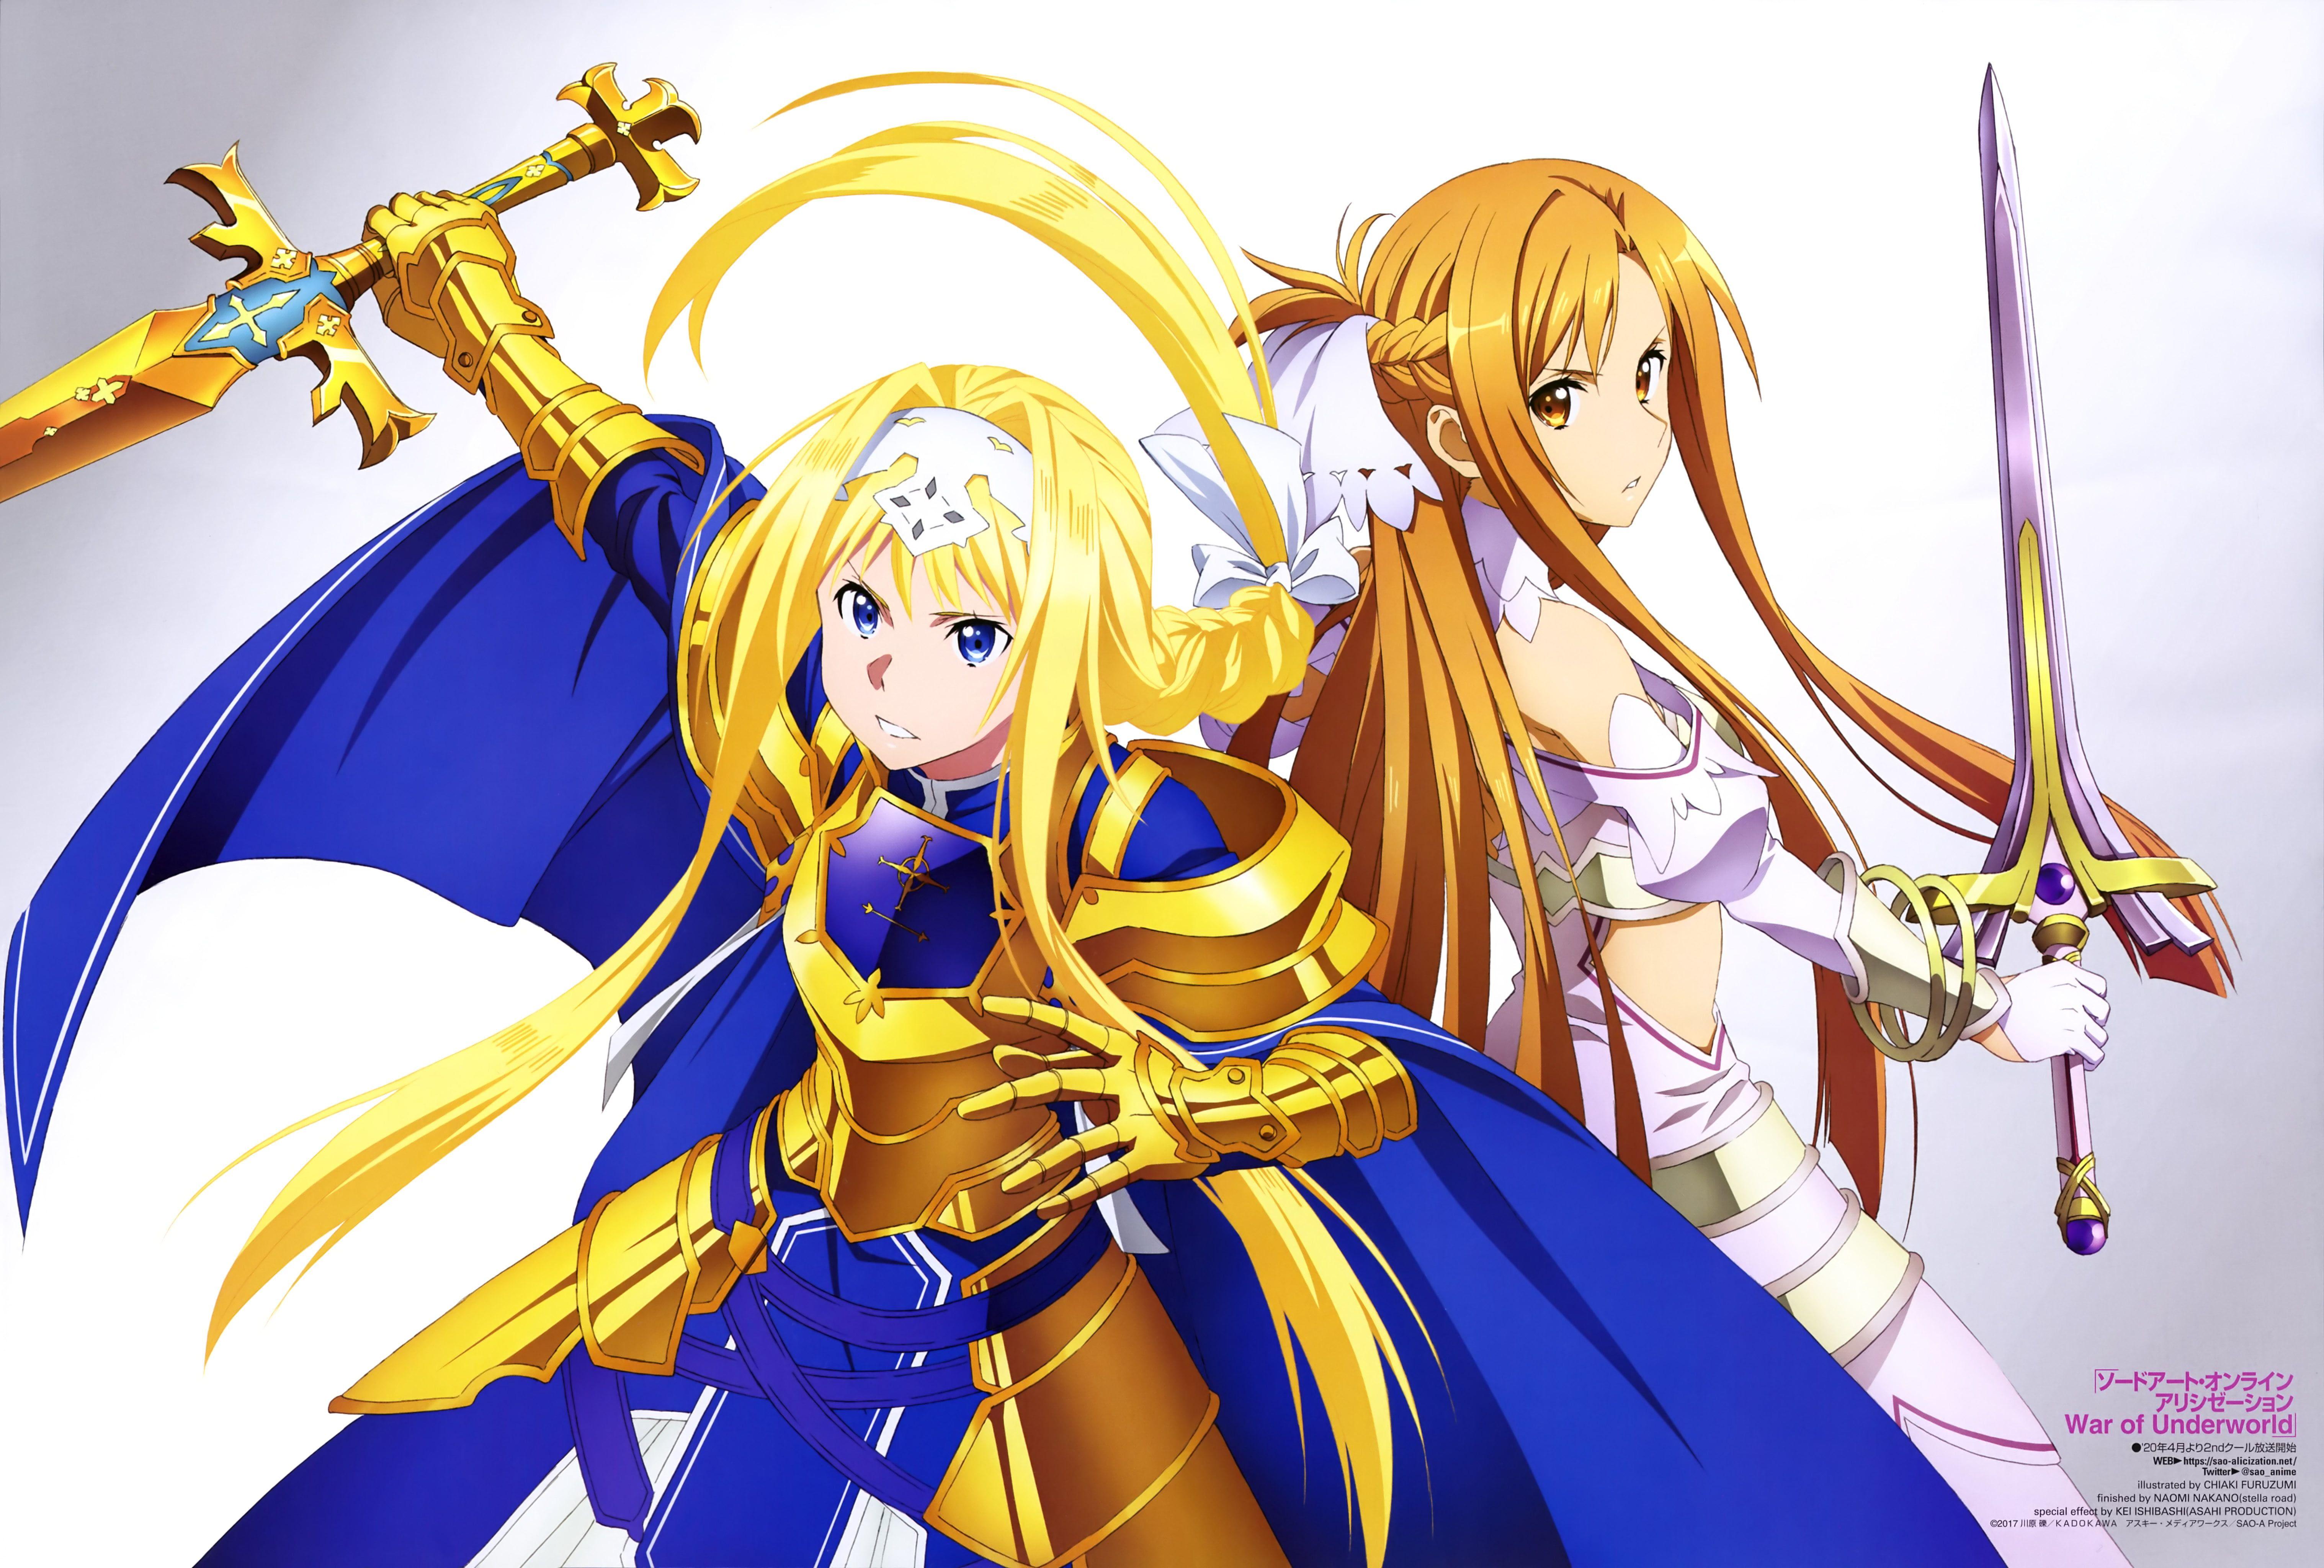 Sword Art Online Sword Art Online Alicization Alice Zuberg Asuna Yuuki 5k Wallpaper Hdwallpape Sword Art Sword Art Online Kirito Sword Art Online Wallpaper